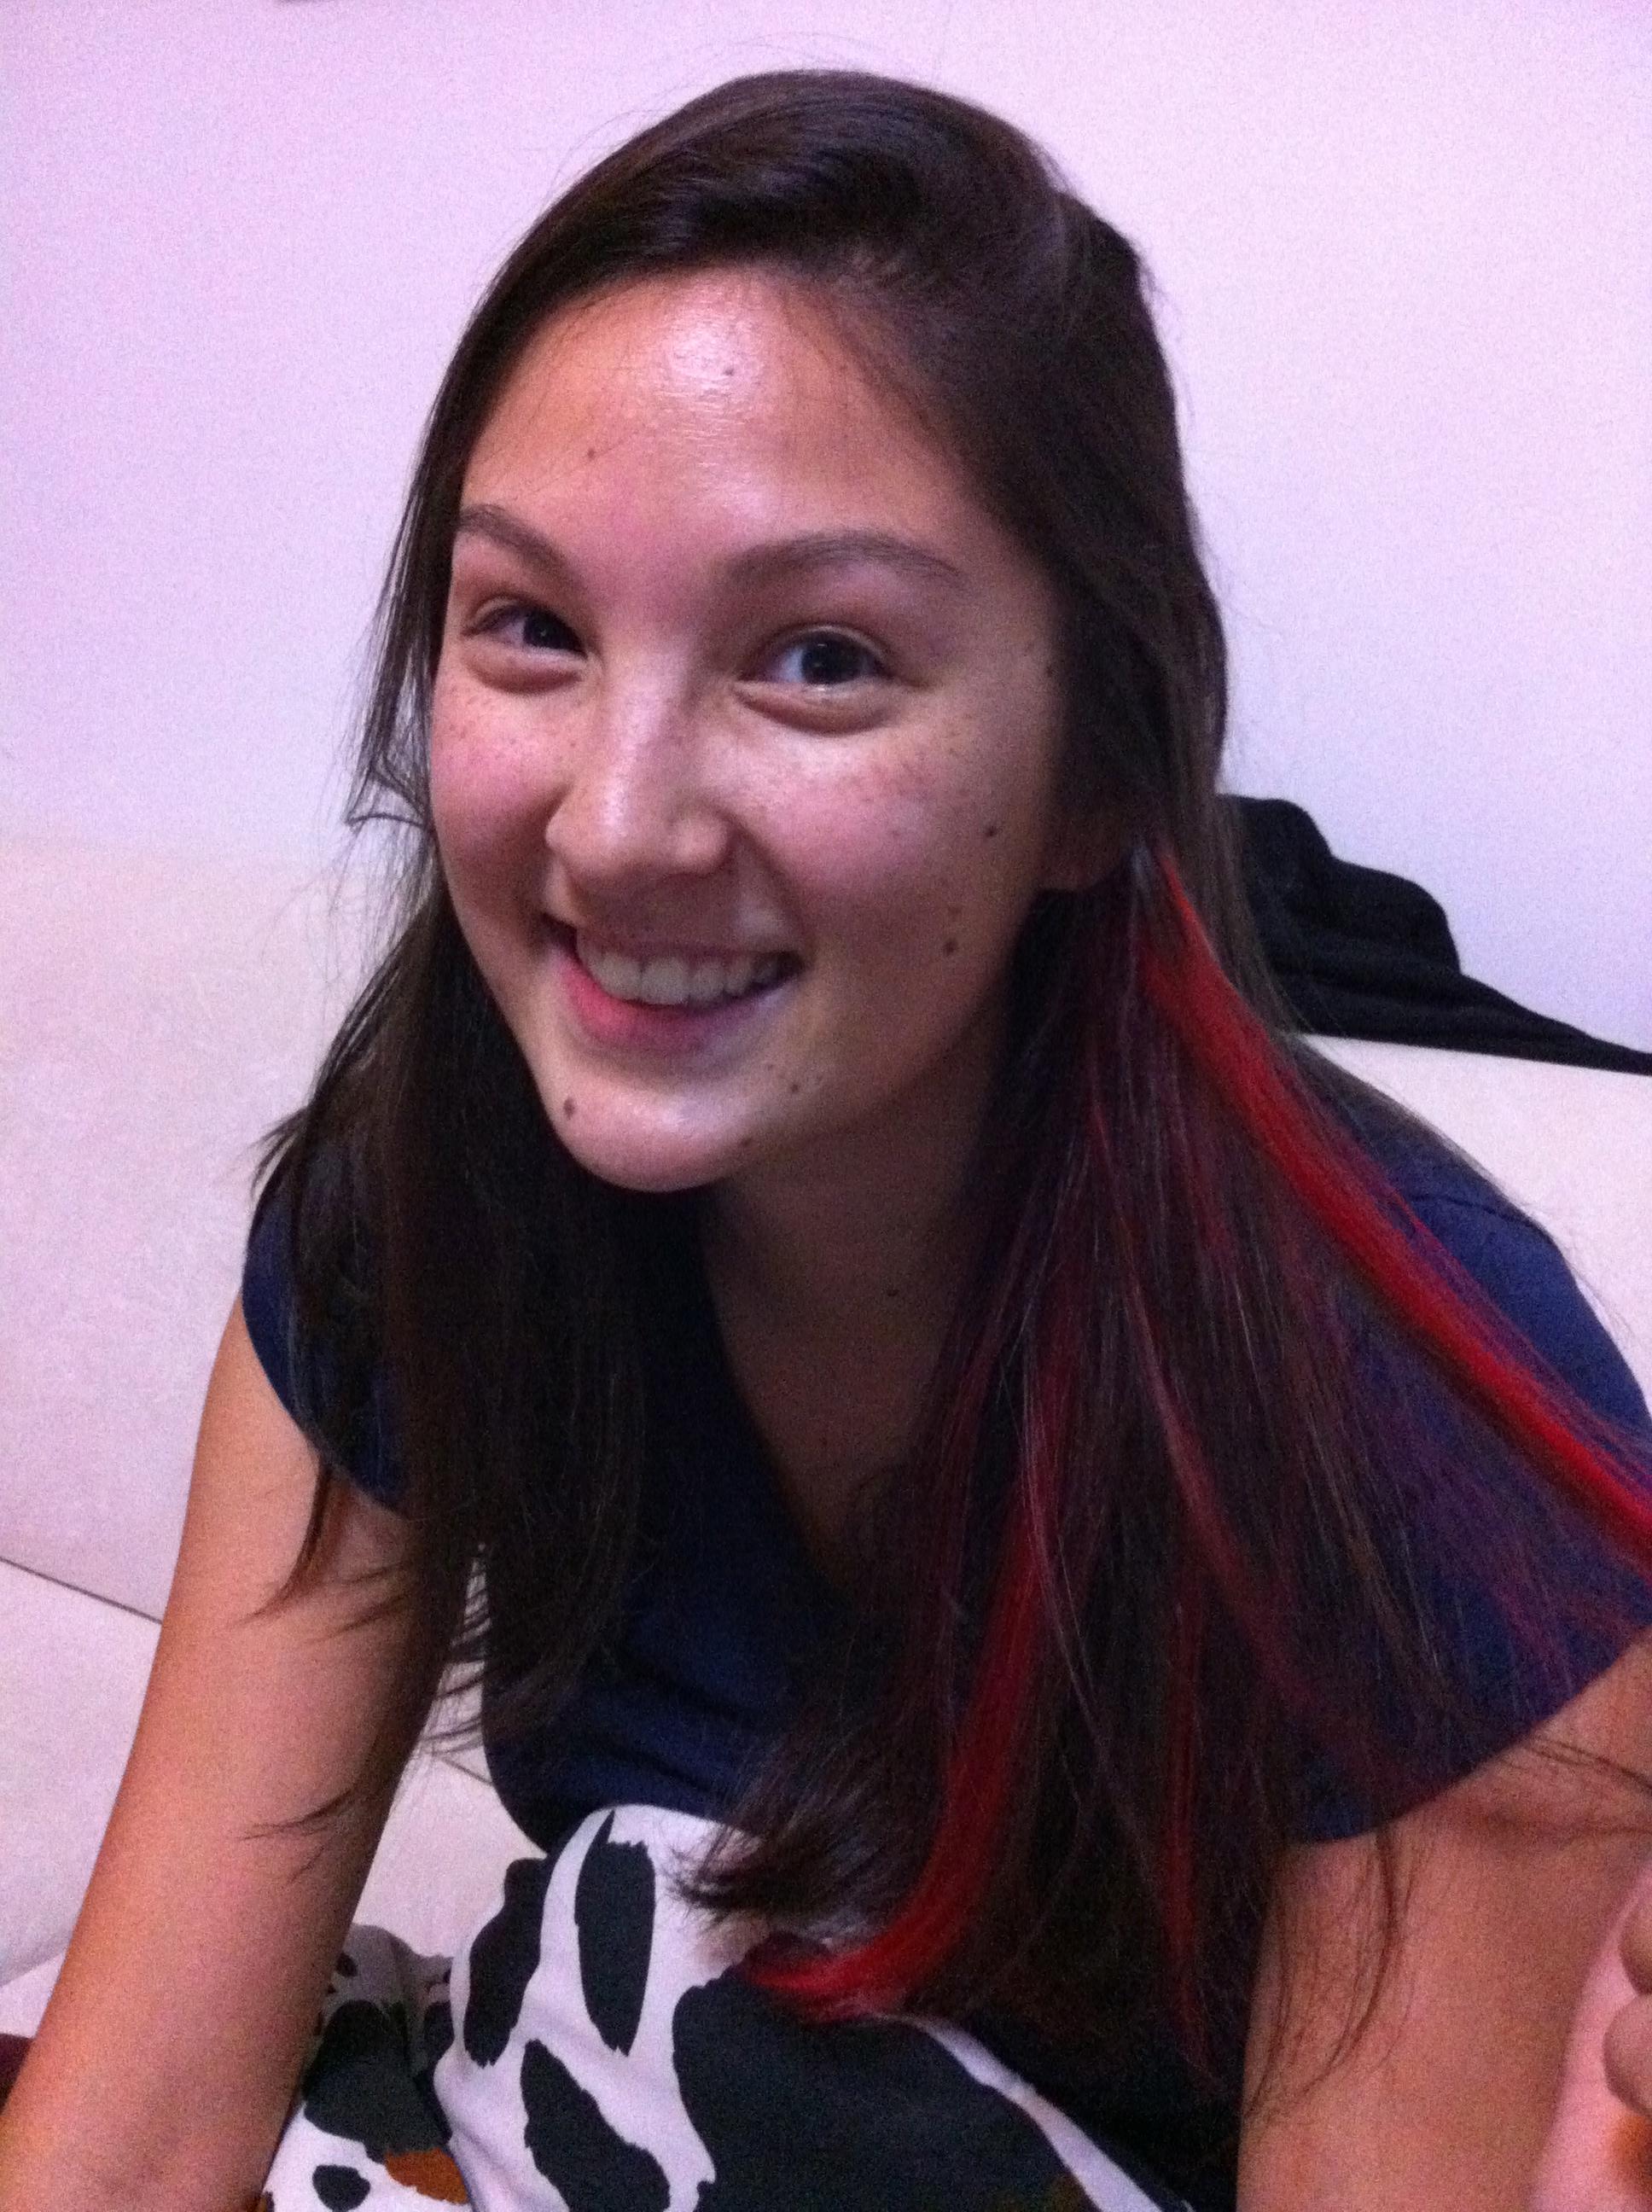 Eggplant Hair Color With Highlights A new hair color!